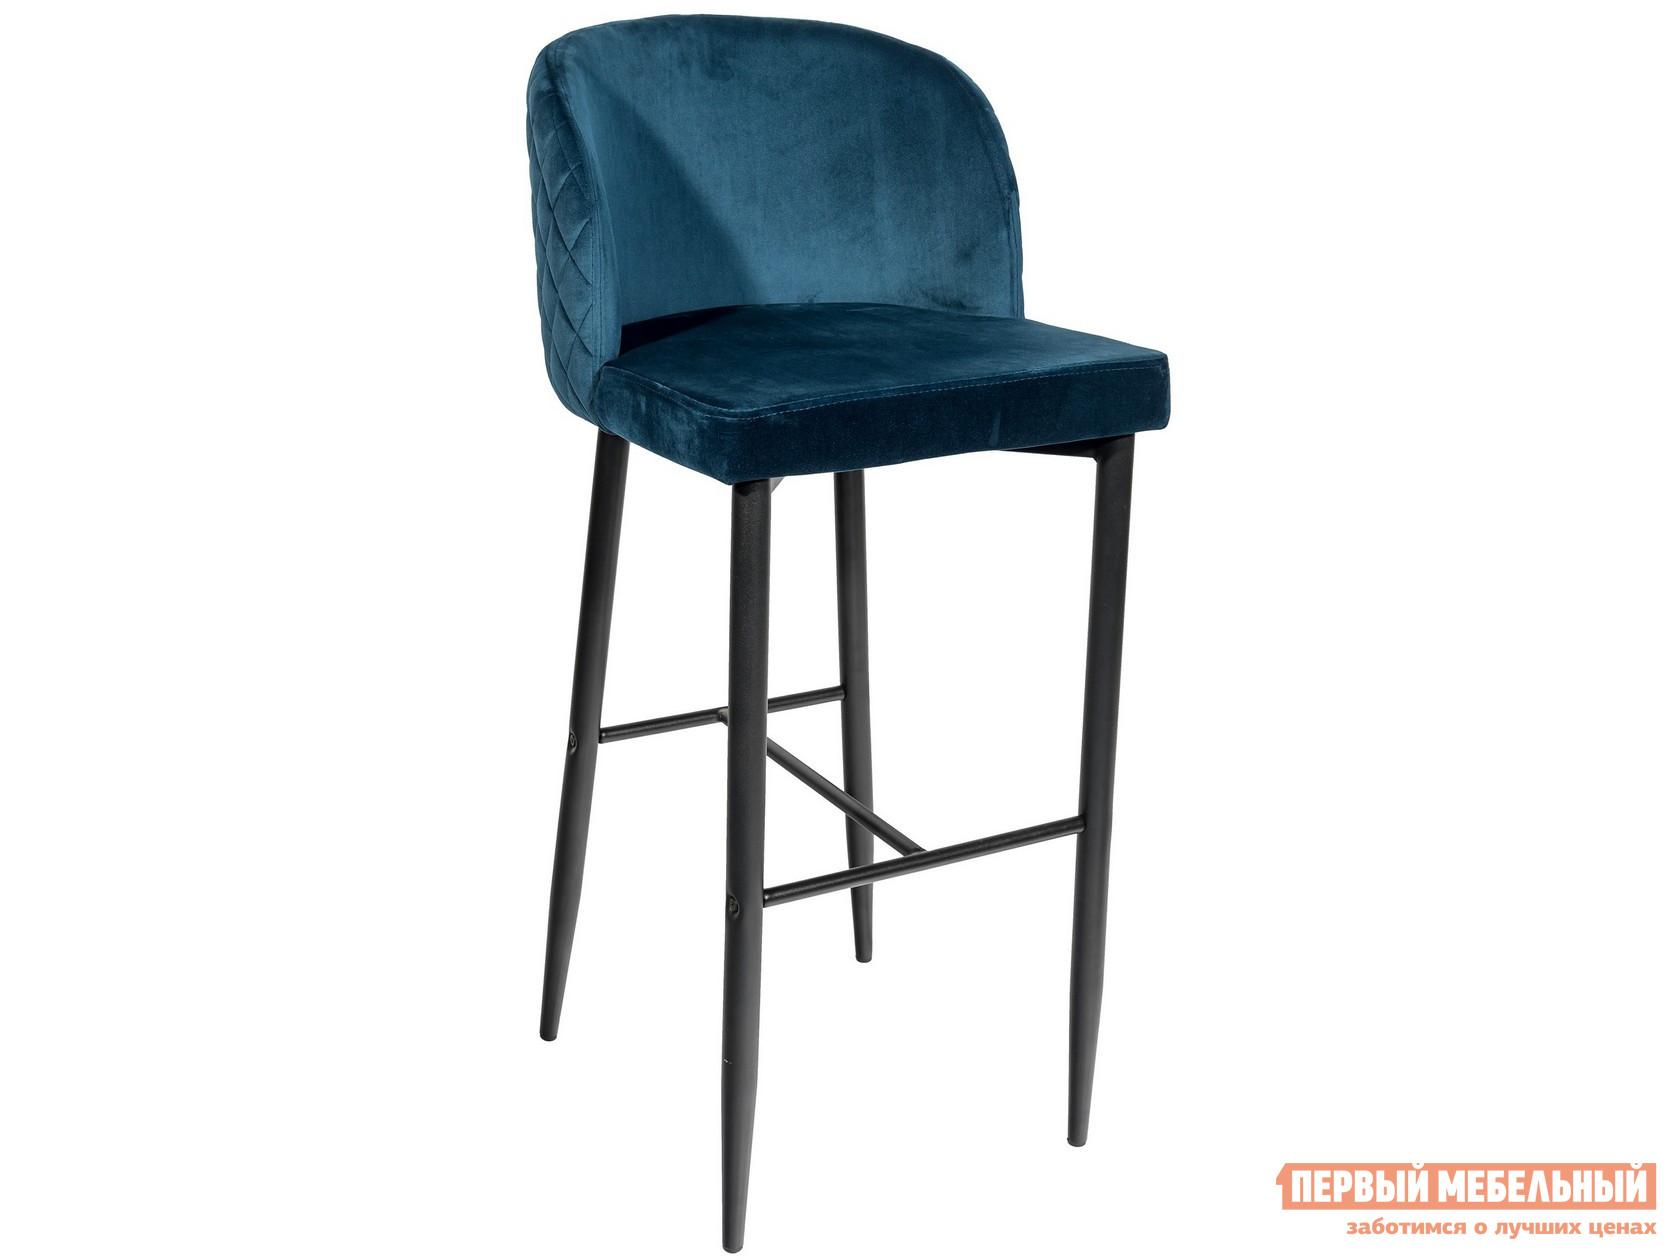 Барный стул  MC11B HLR-63 Сине-зеленый, велюр Stool Group 85894